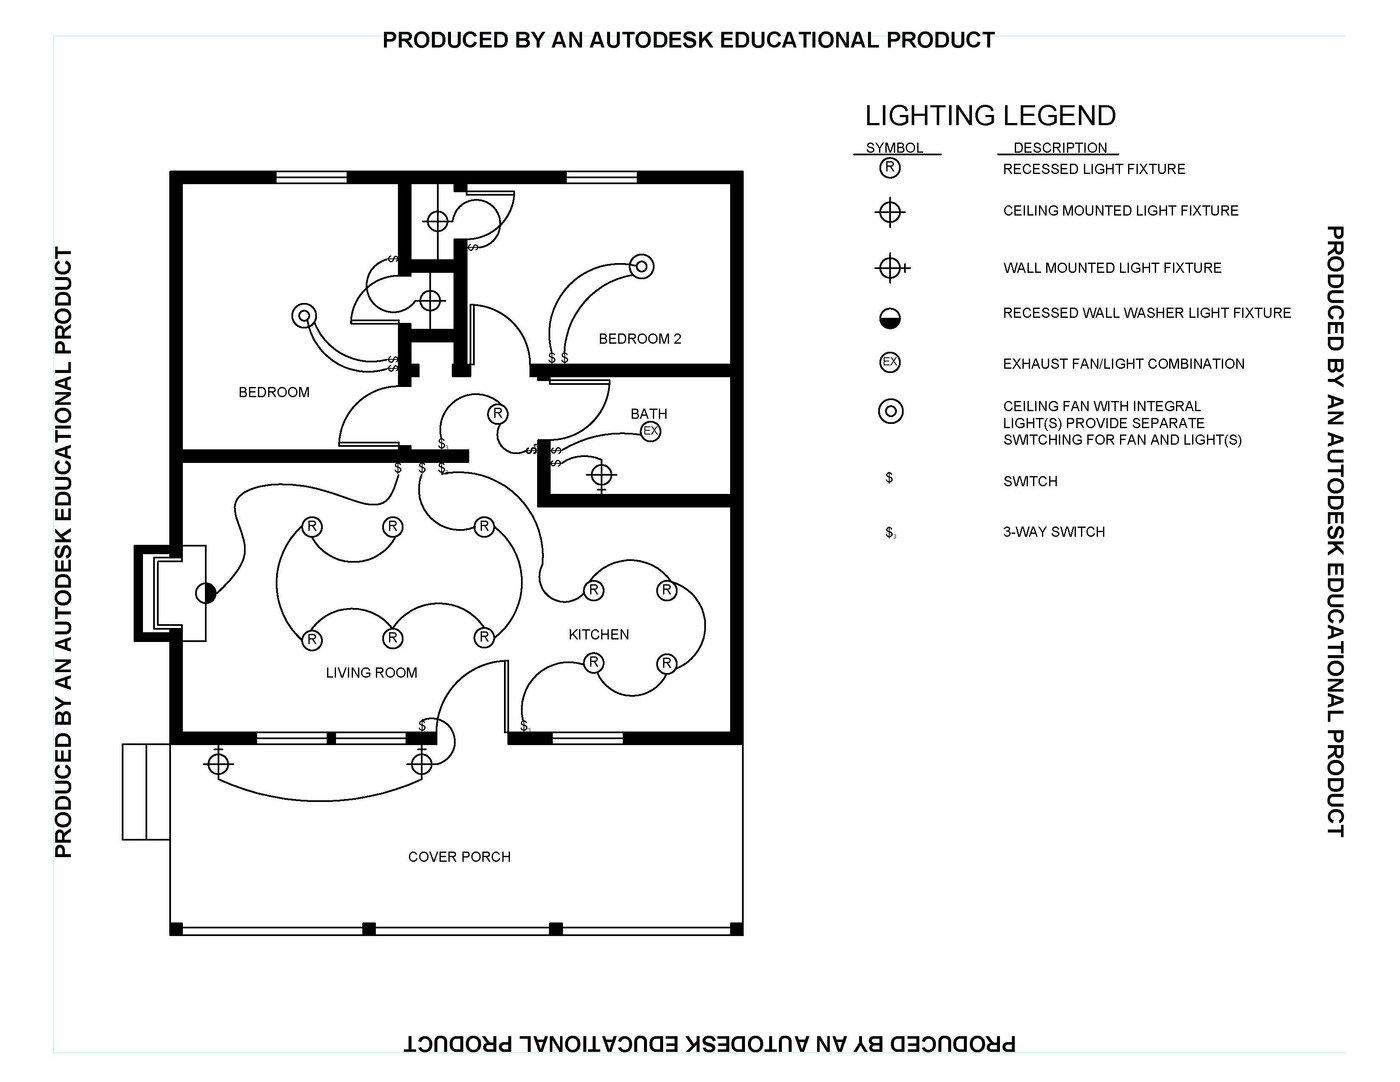 CAD Lighting Plan by Dashawn Wilson at Coroflot.com